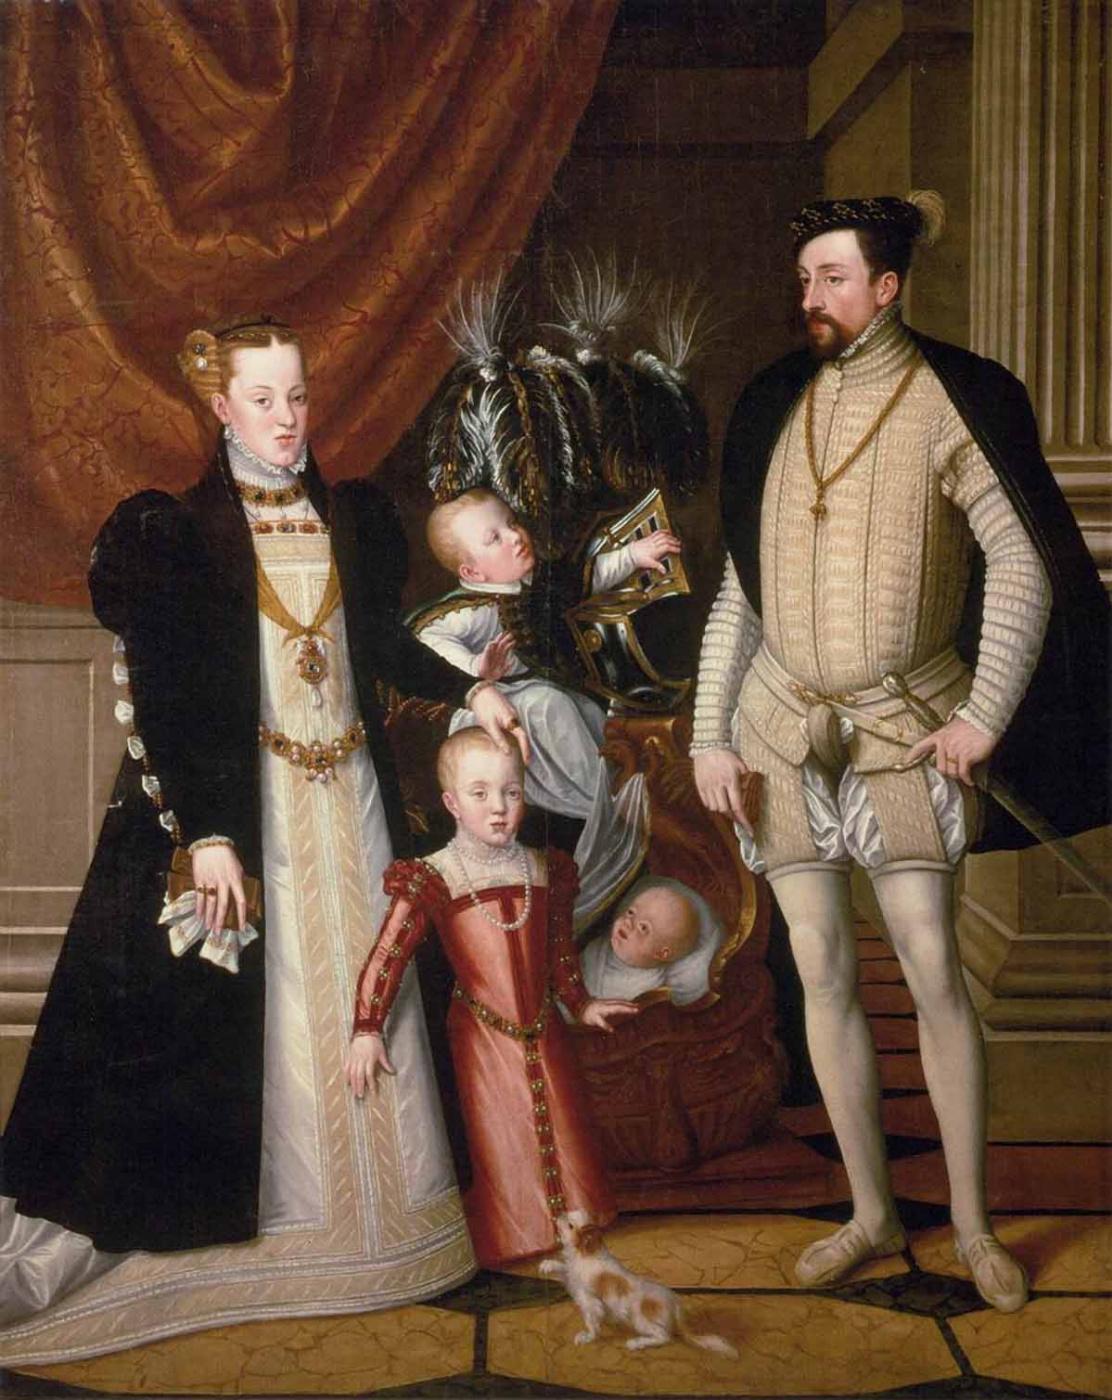 Giuseppe Arcimboldo. Portrait of Emperor Maximilian II with his family